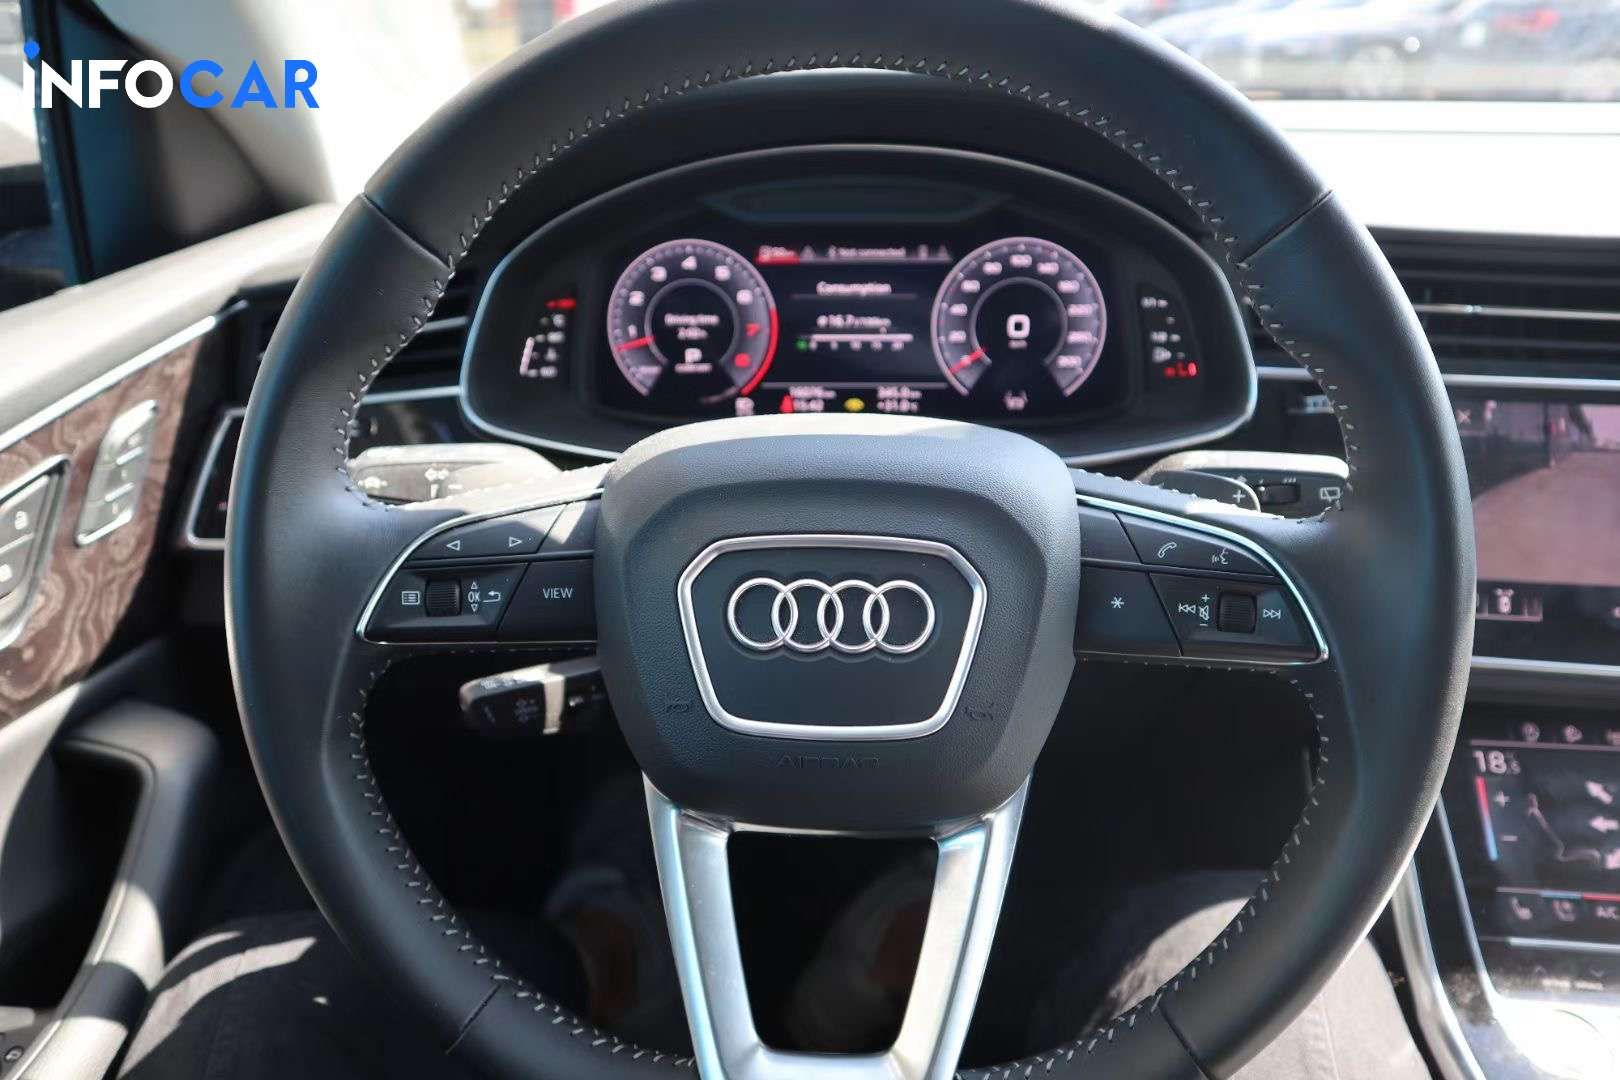 2019 Audi Q8 55TFSI Quattro - INFOCAR - Toronto's Most Comprehensive New and Used Auto Trading Platform